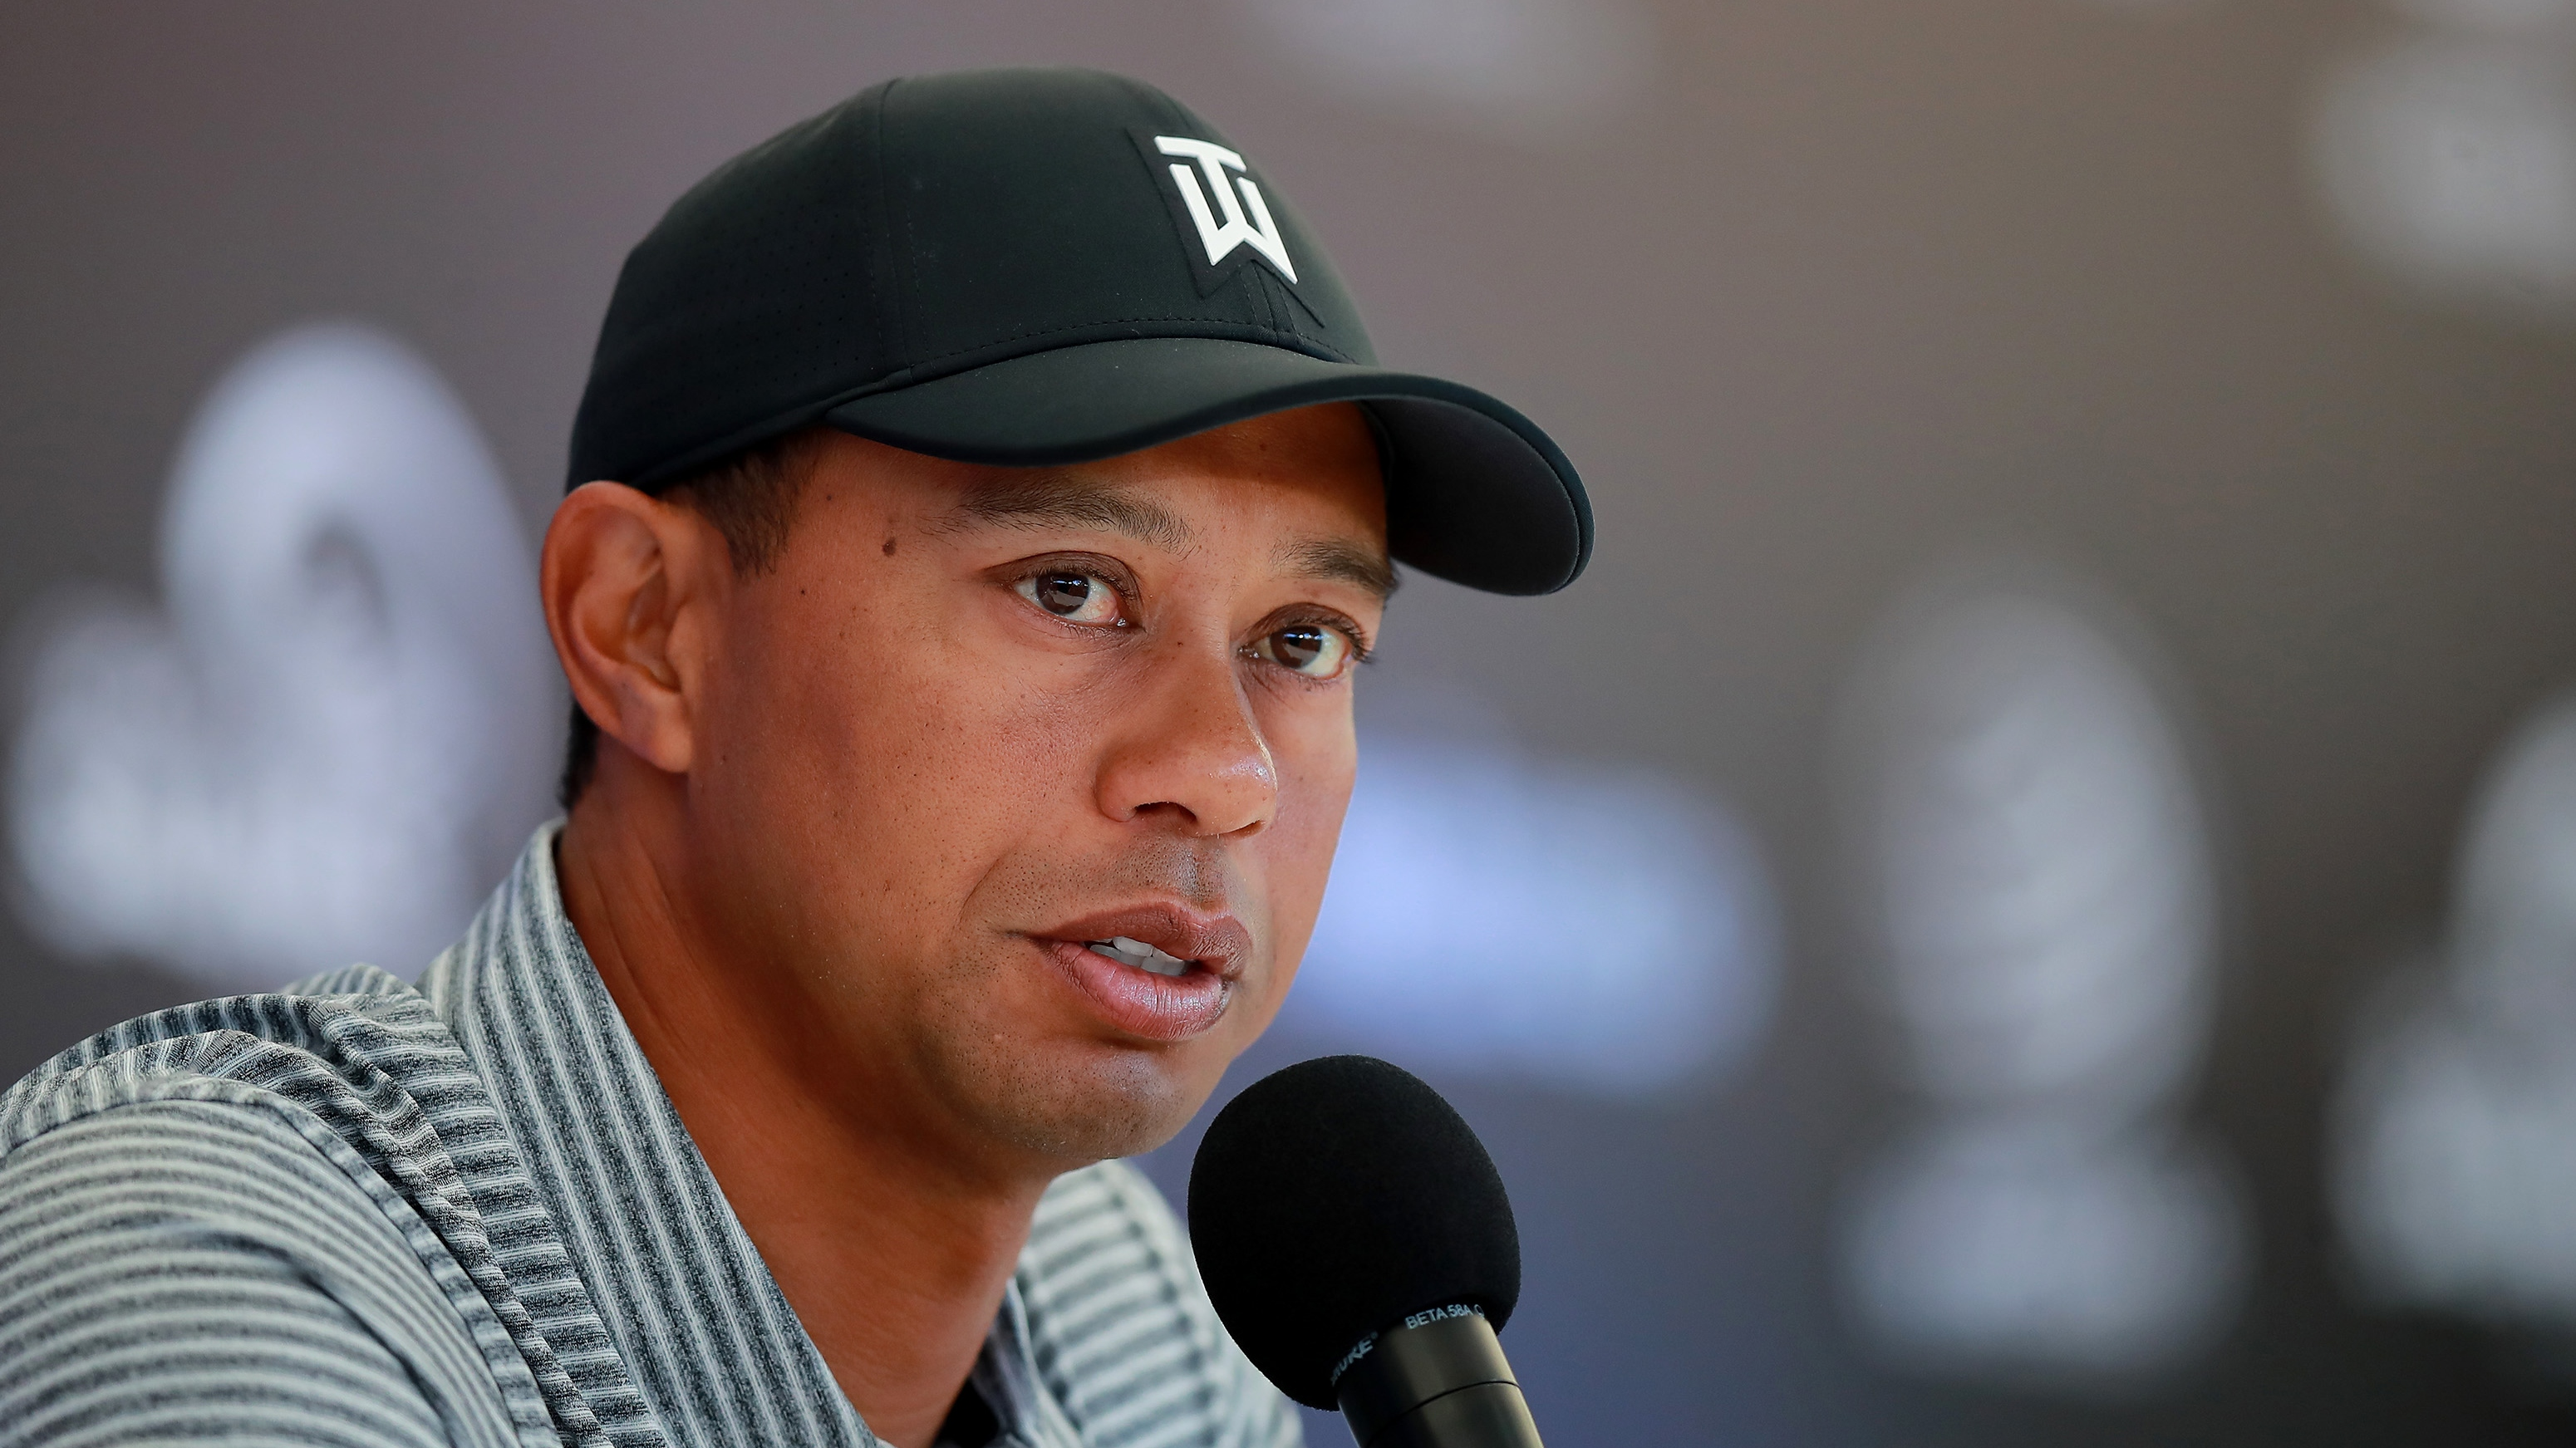 Tiger Woods speak media next injury players championship